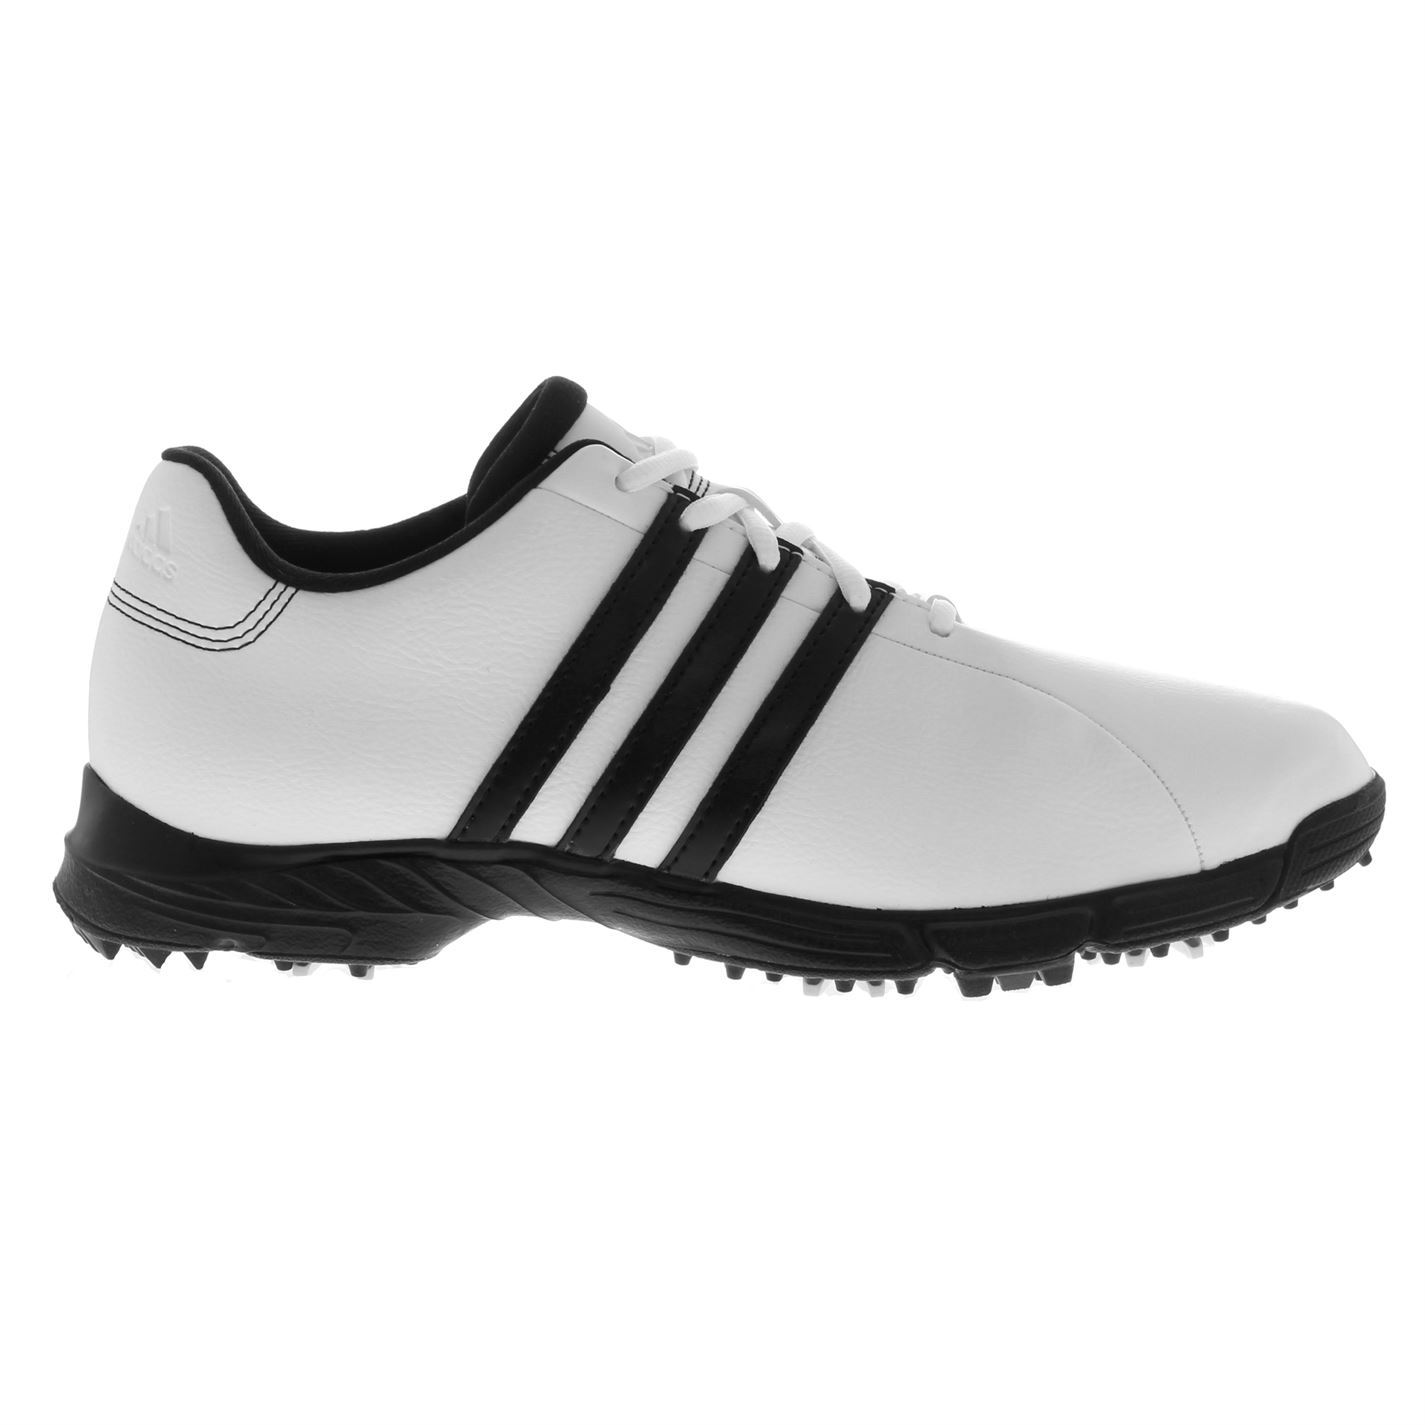 adidas-Golflite-Golf-Shoes-Mens-Spikes-Footwear thumbnail 13